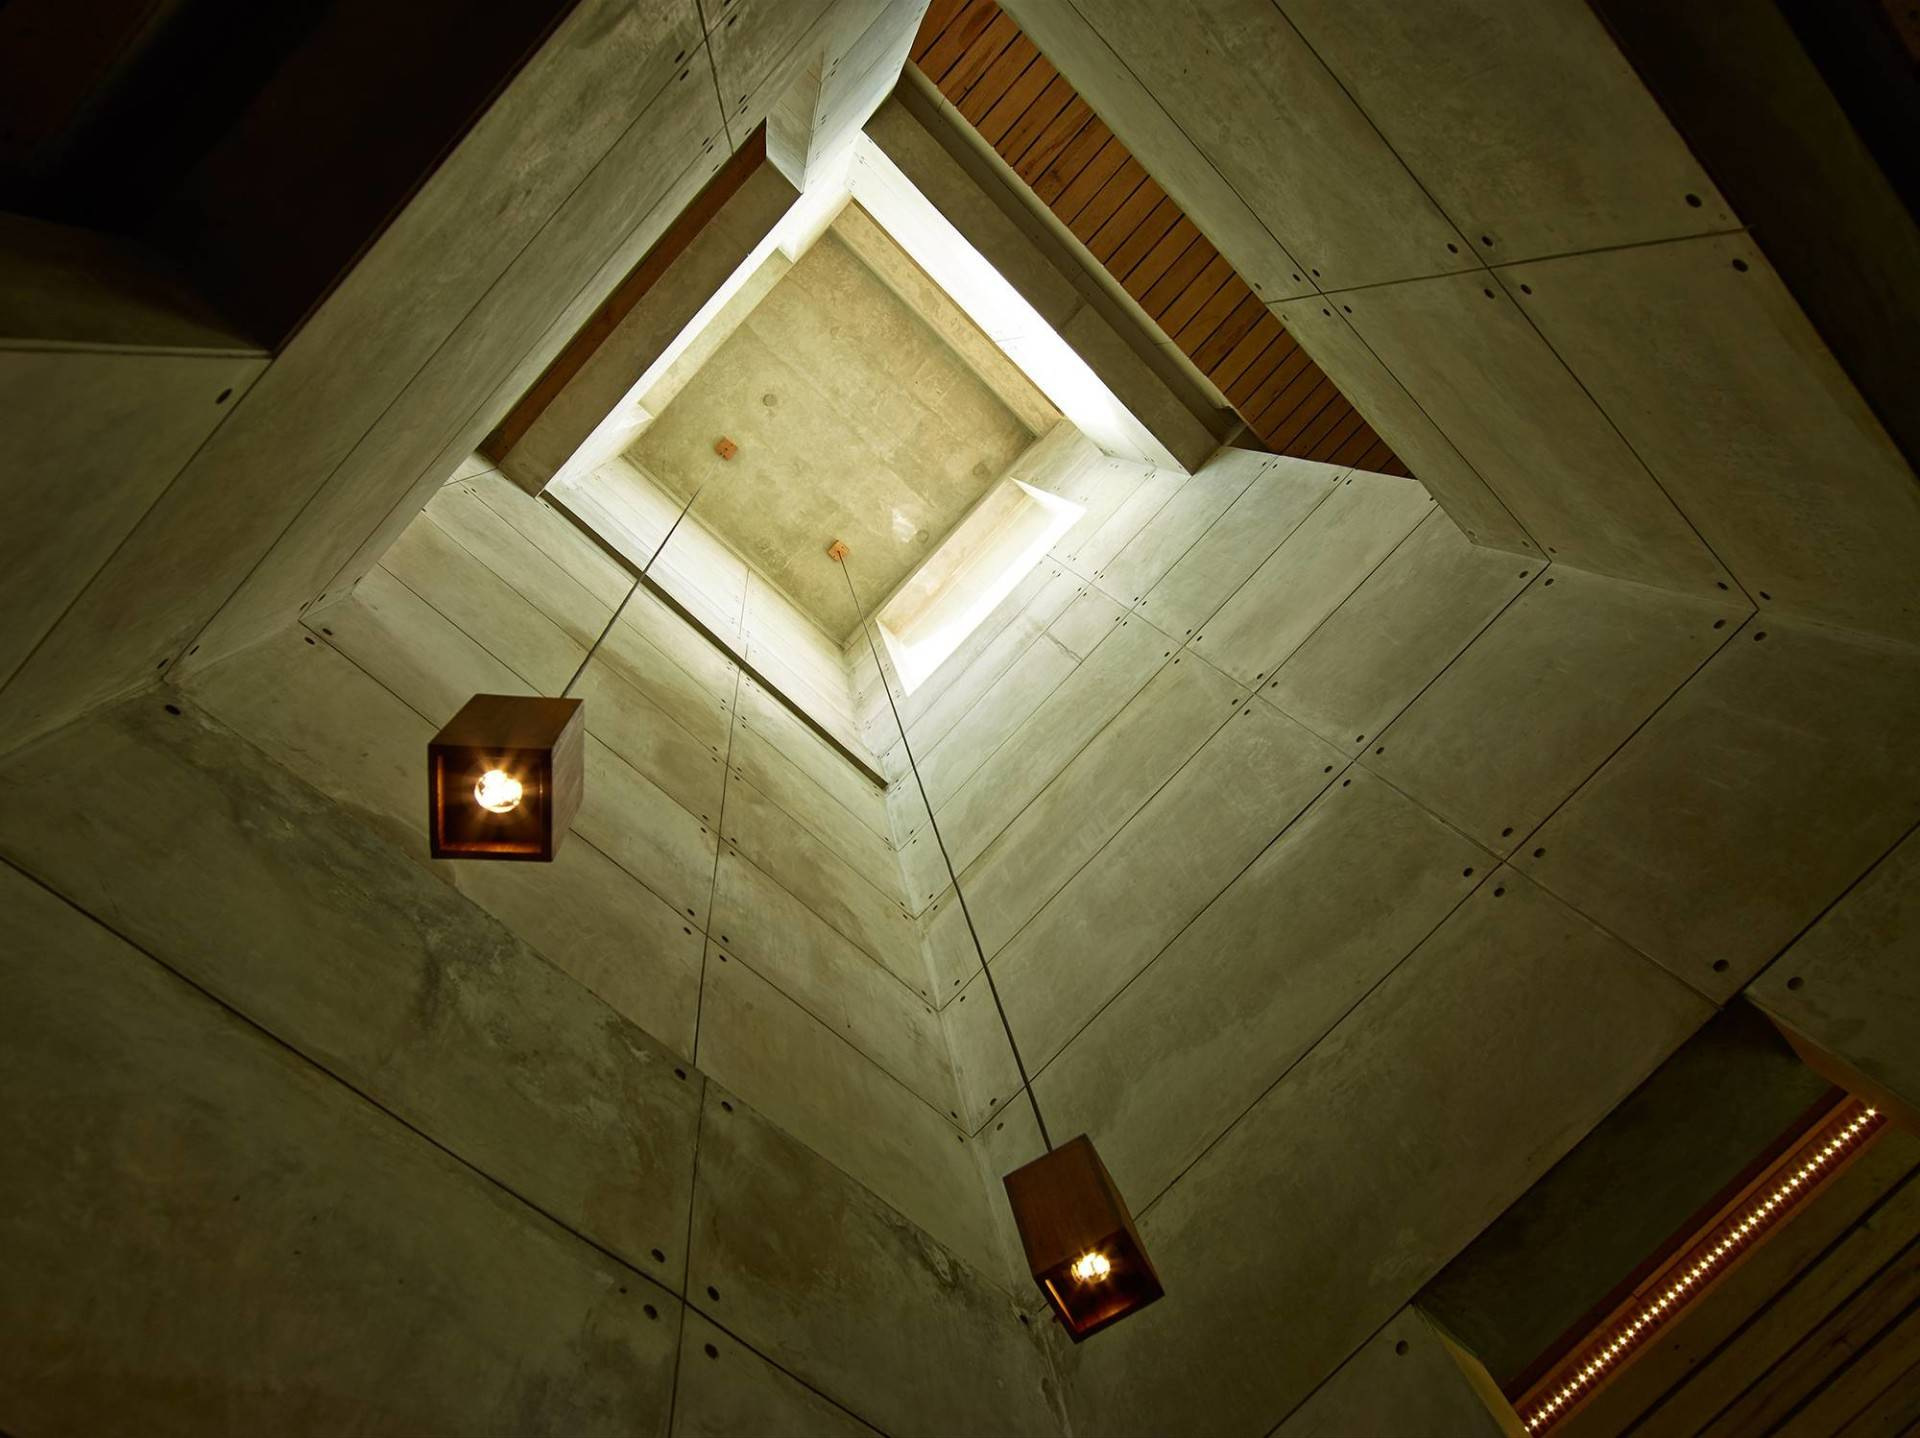 Raw Architecture Bare Minimalist Jakarta, Indonesia Jakarta, Indonesia Ceiling   1550